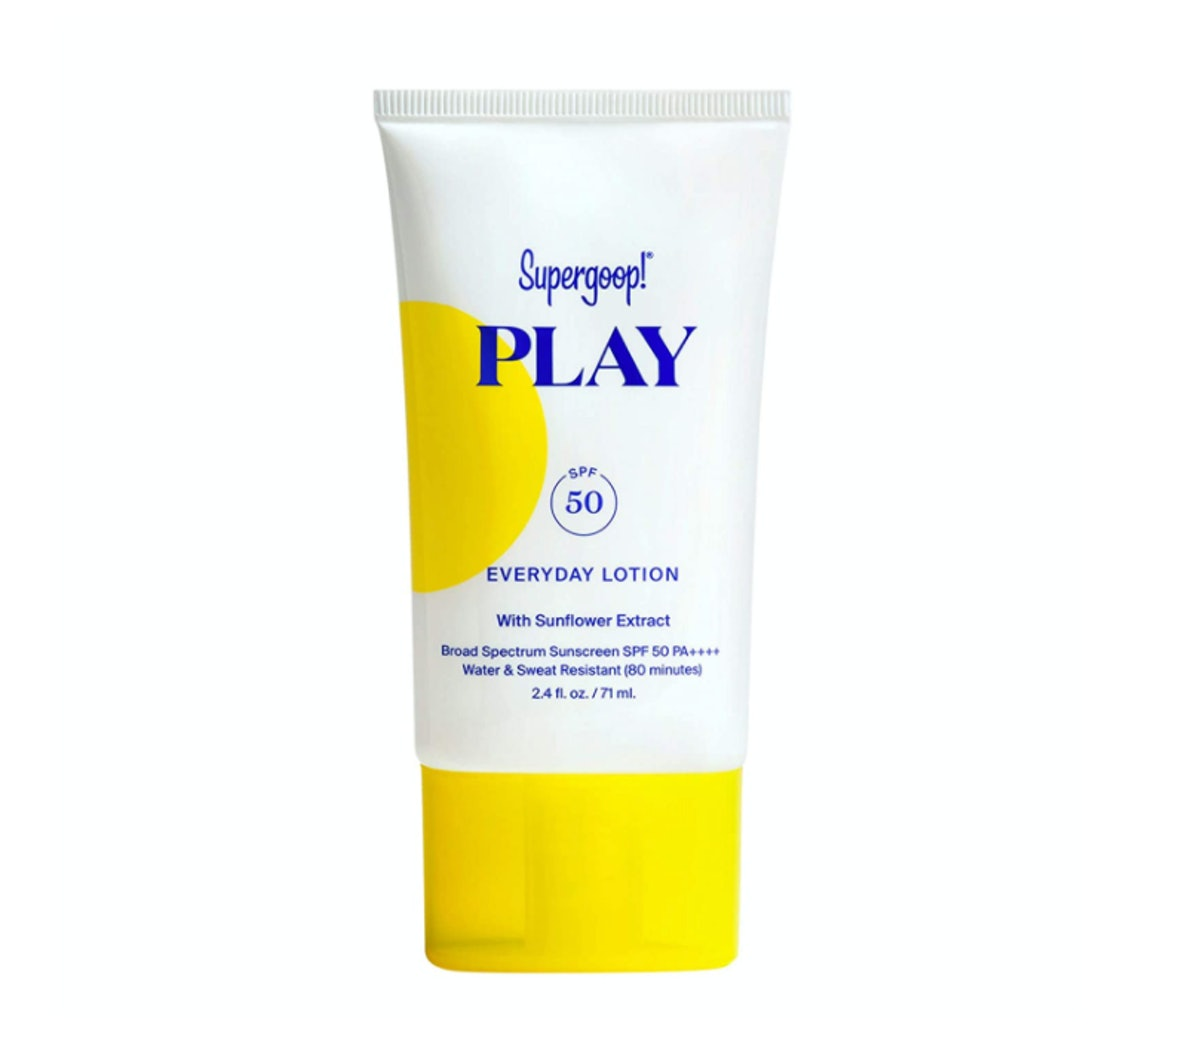 Supergoop PLAY Sunscreen, 2.4 fl. oz.